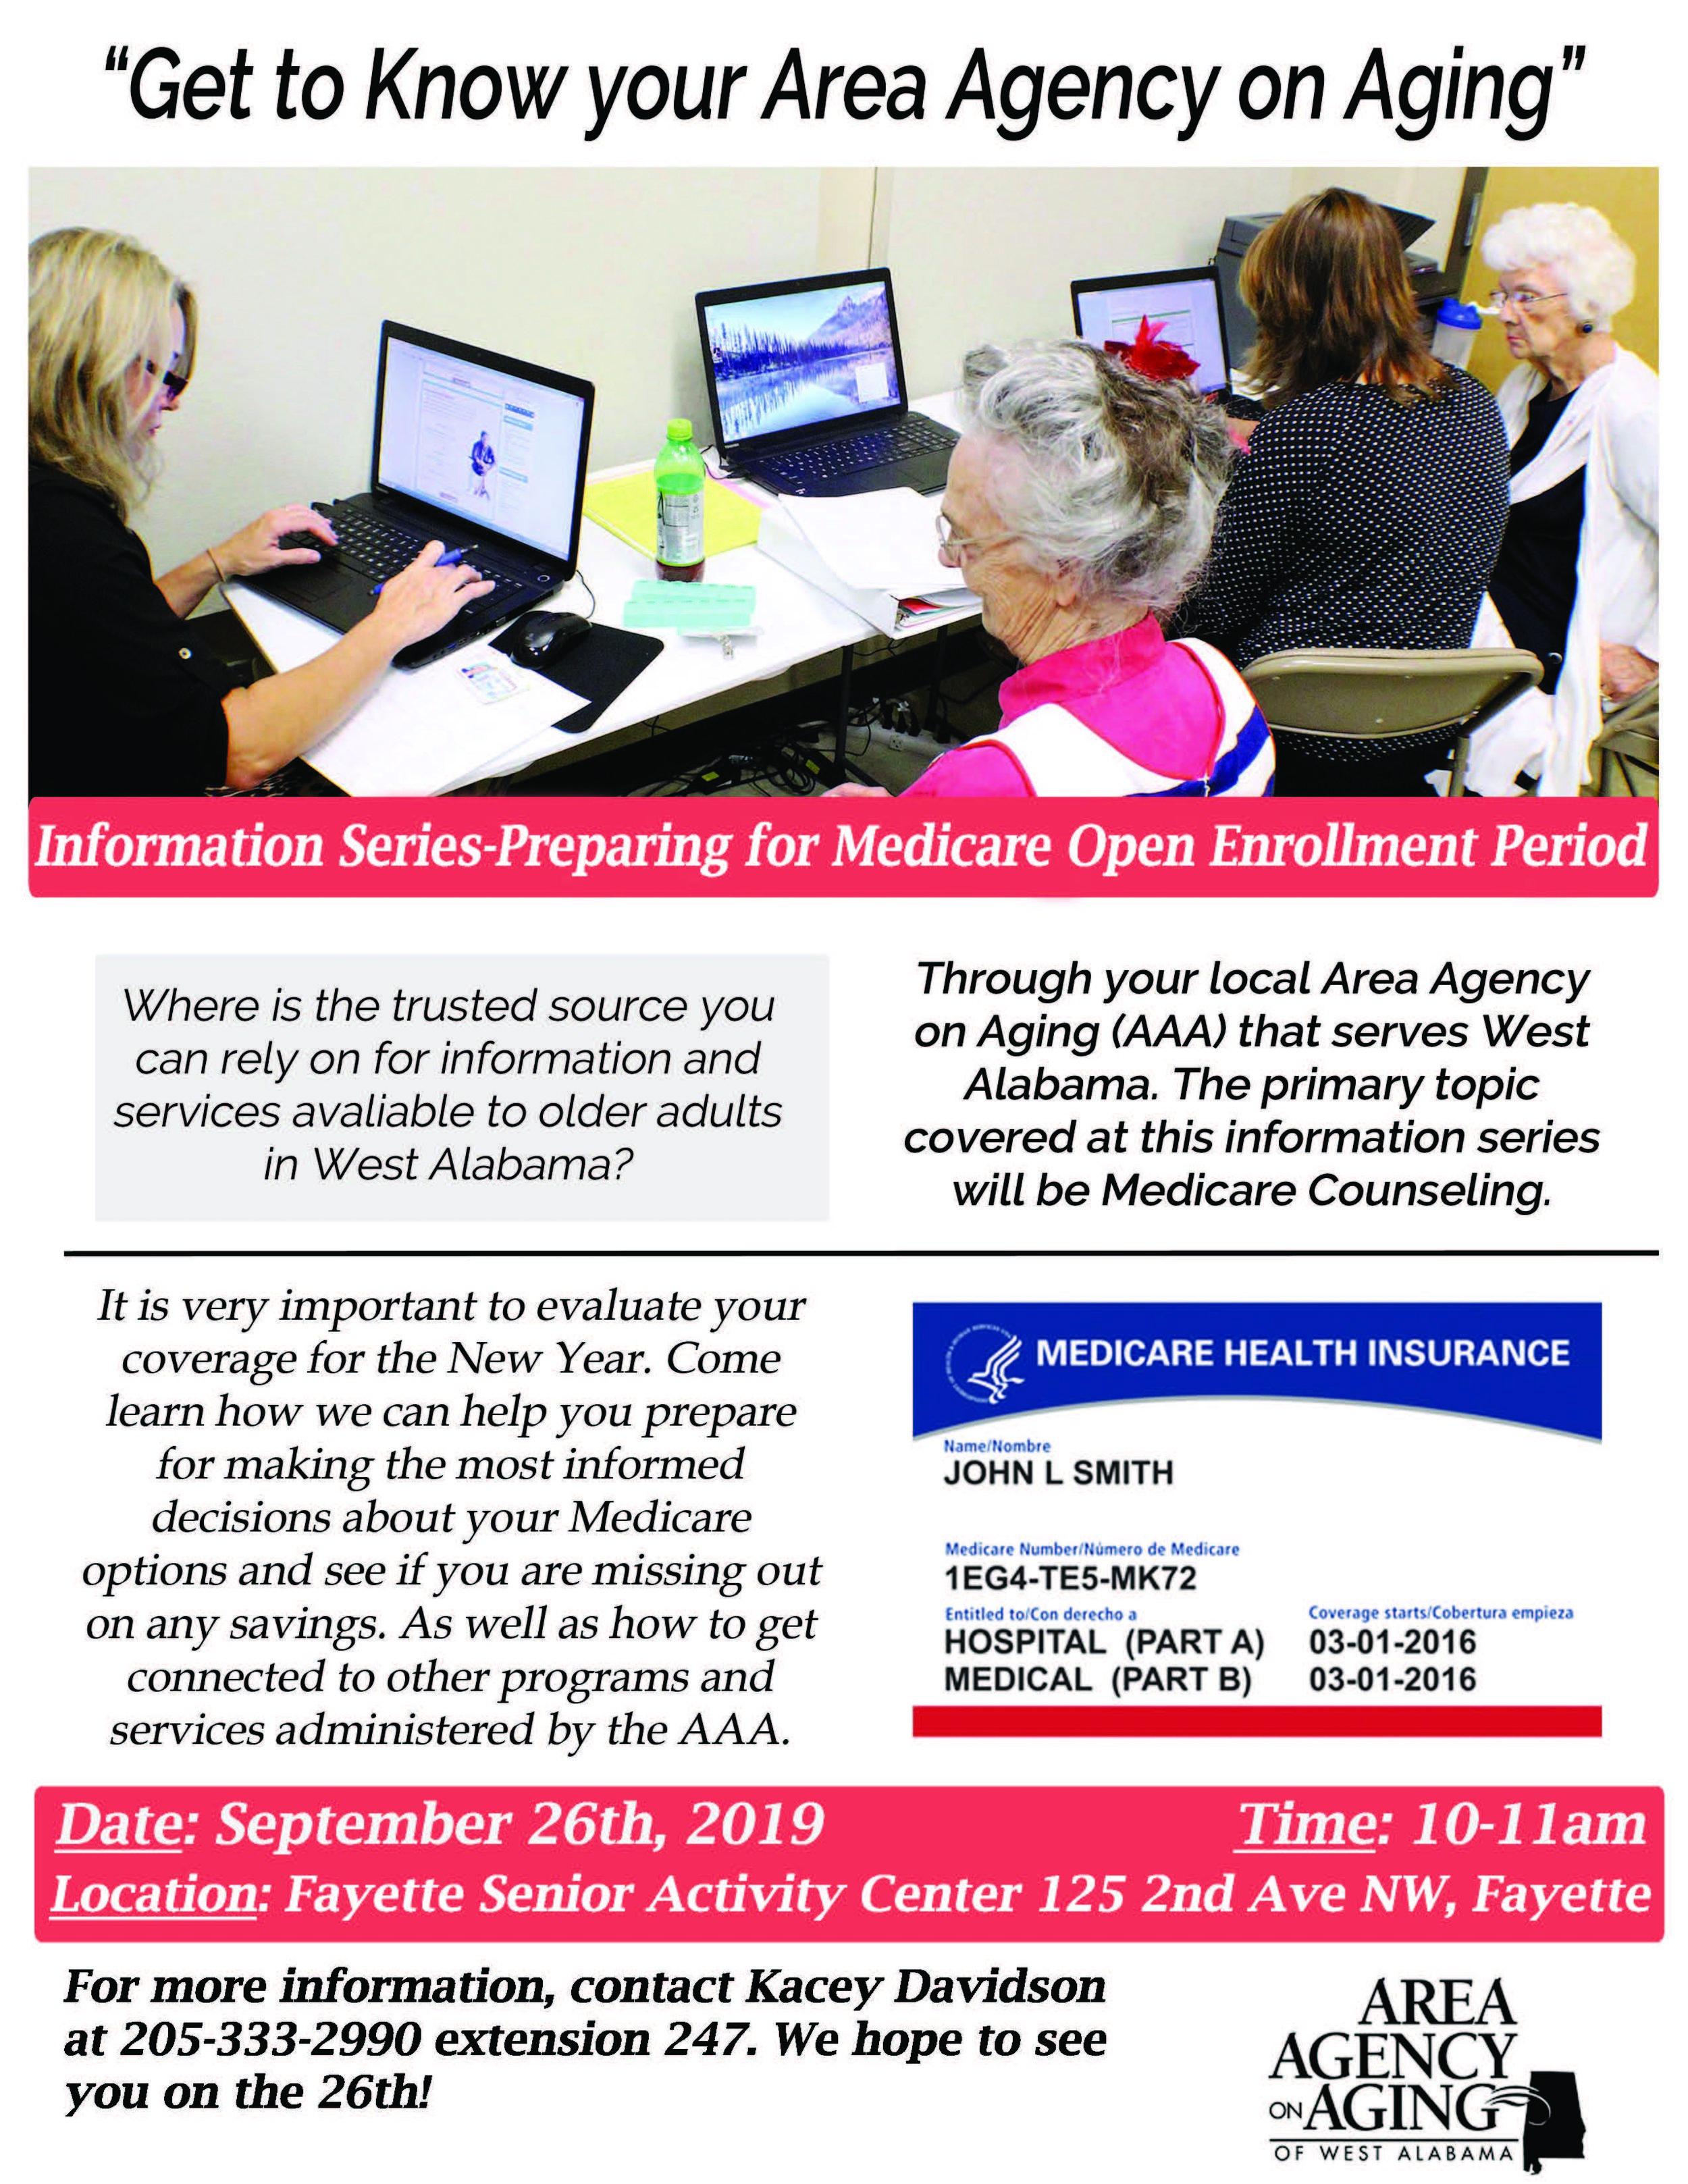 Medicare Counseling Flyer 2019 - Fayette.jpg